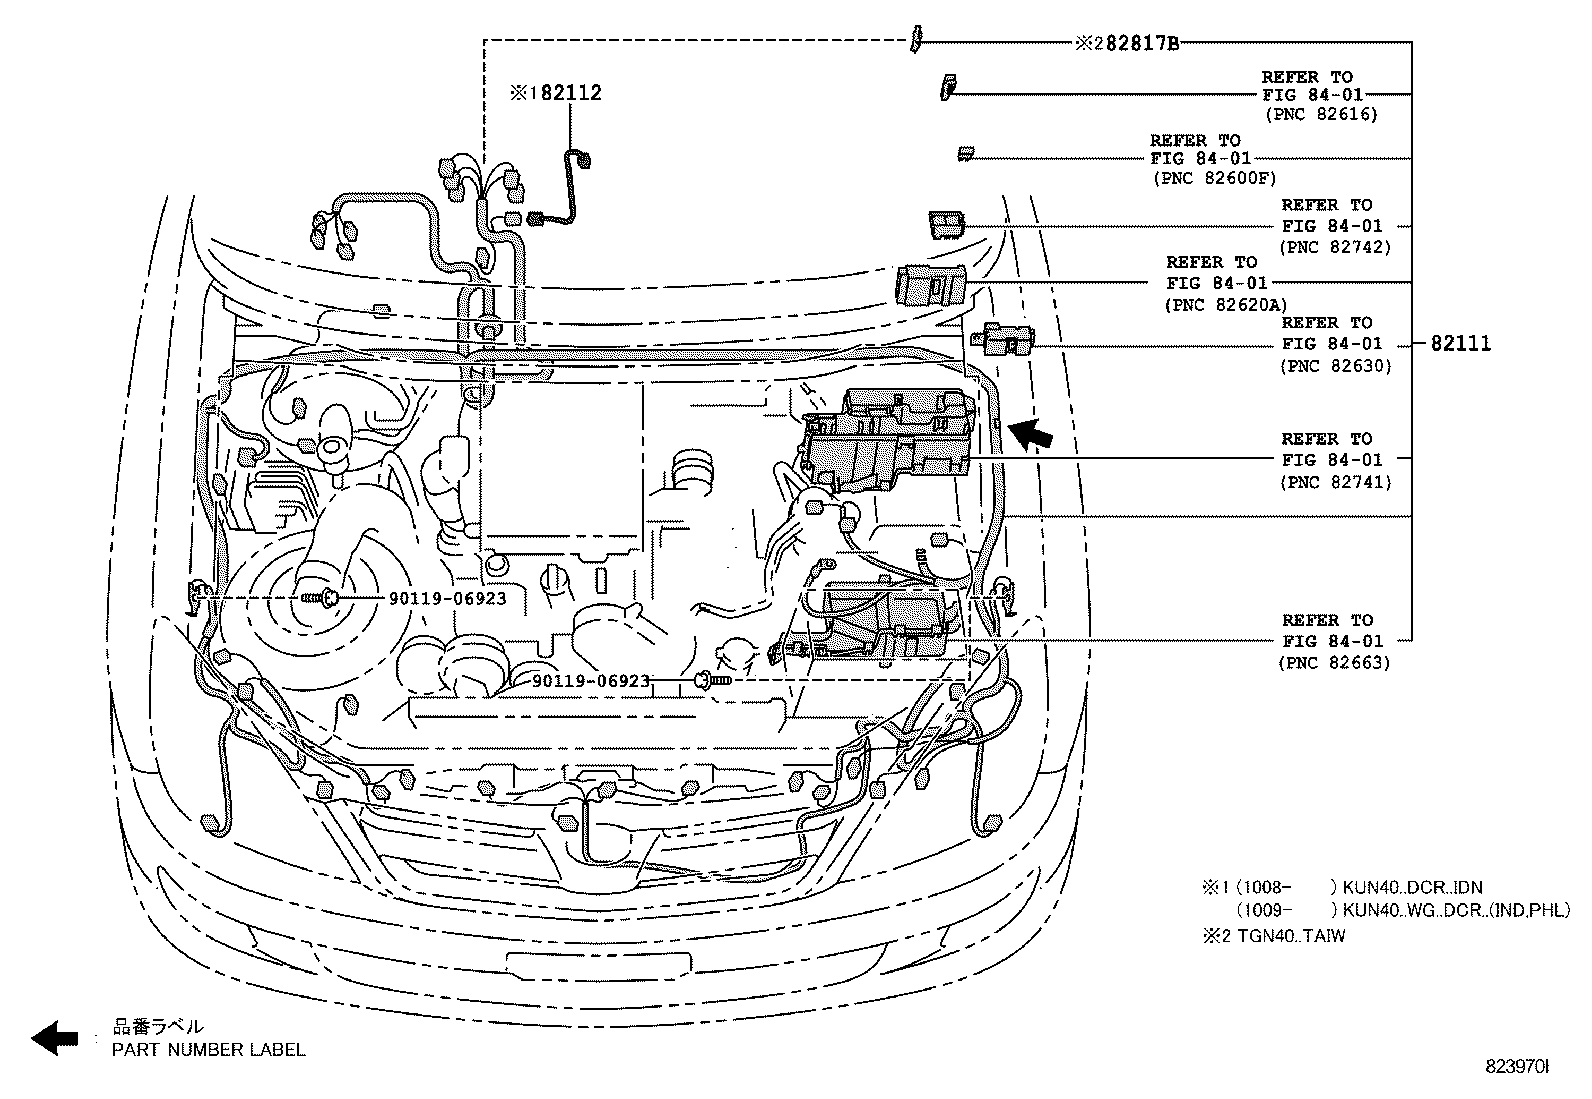 DIAGRAM] Toyota Innova 2012 Wiring Diagram FULL Version HD Quality Wiring  Diagram - ACWIRING5S.RADIOSTUDIOUNO.ITDiagram Database